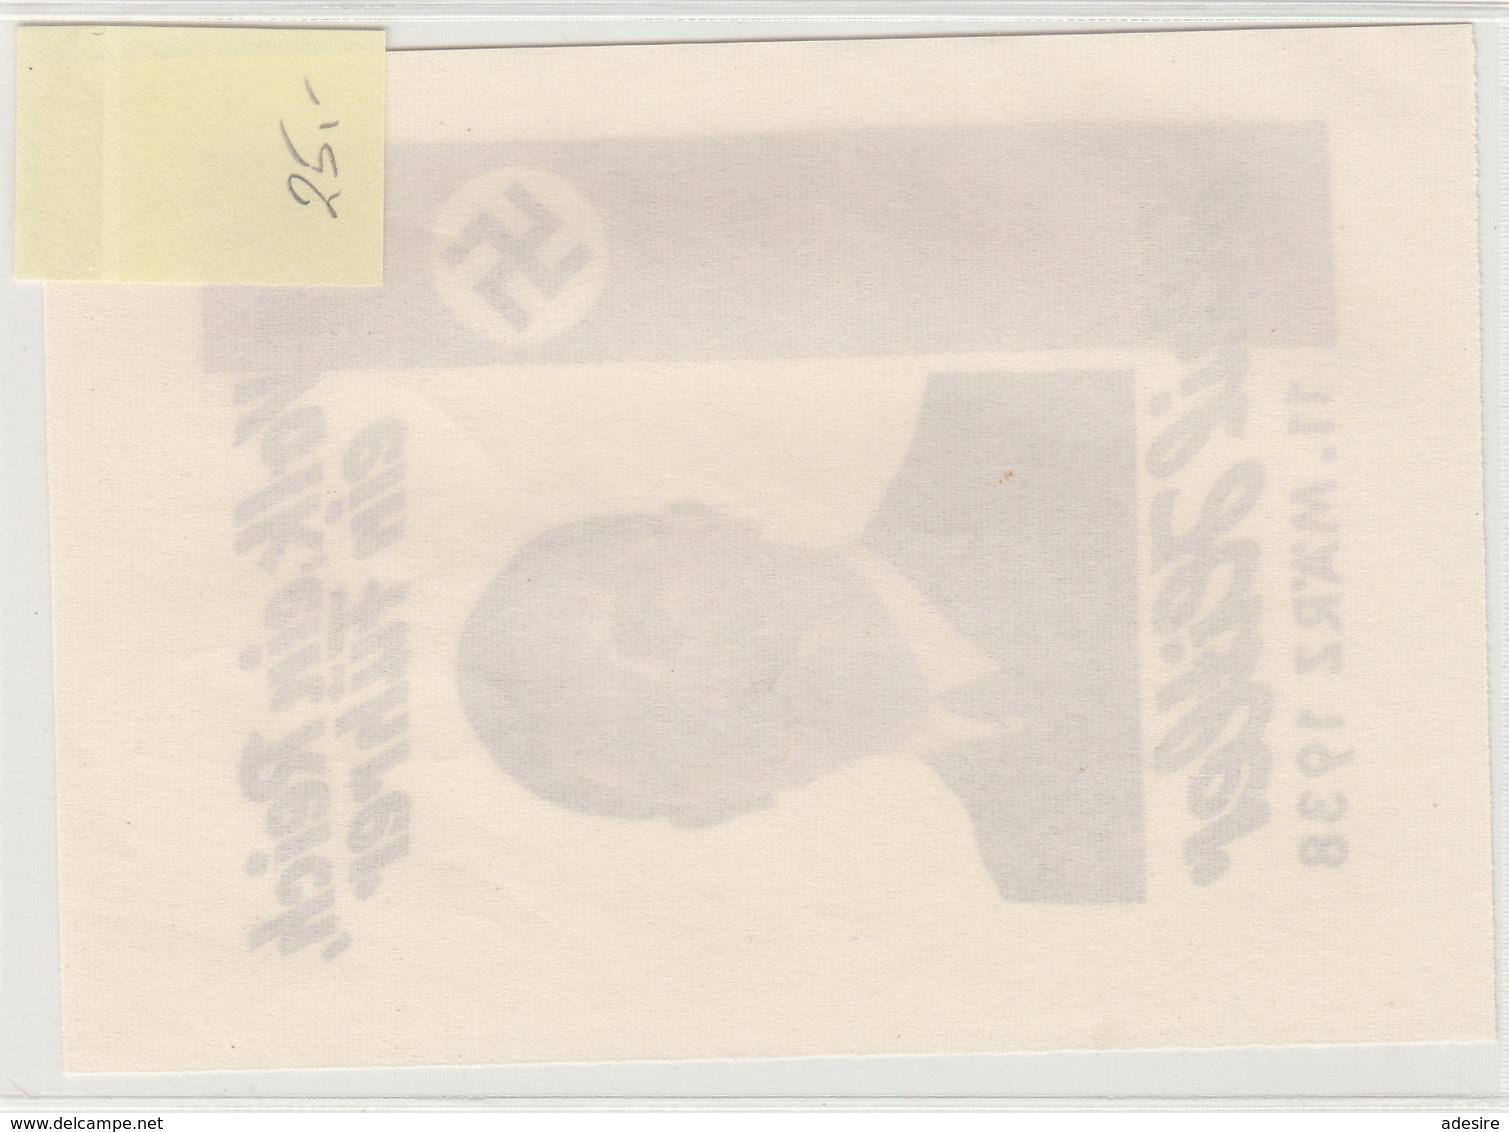 PROPAGANDA Bildpostkarte 1938, HITLER, EIN VOLK … - Personen